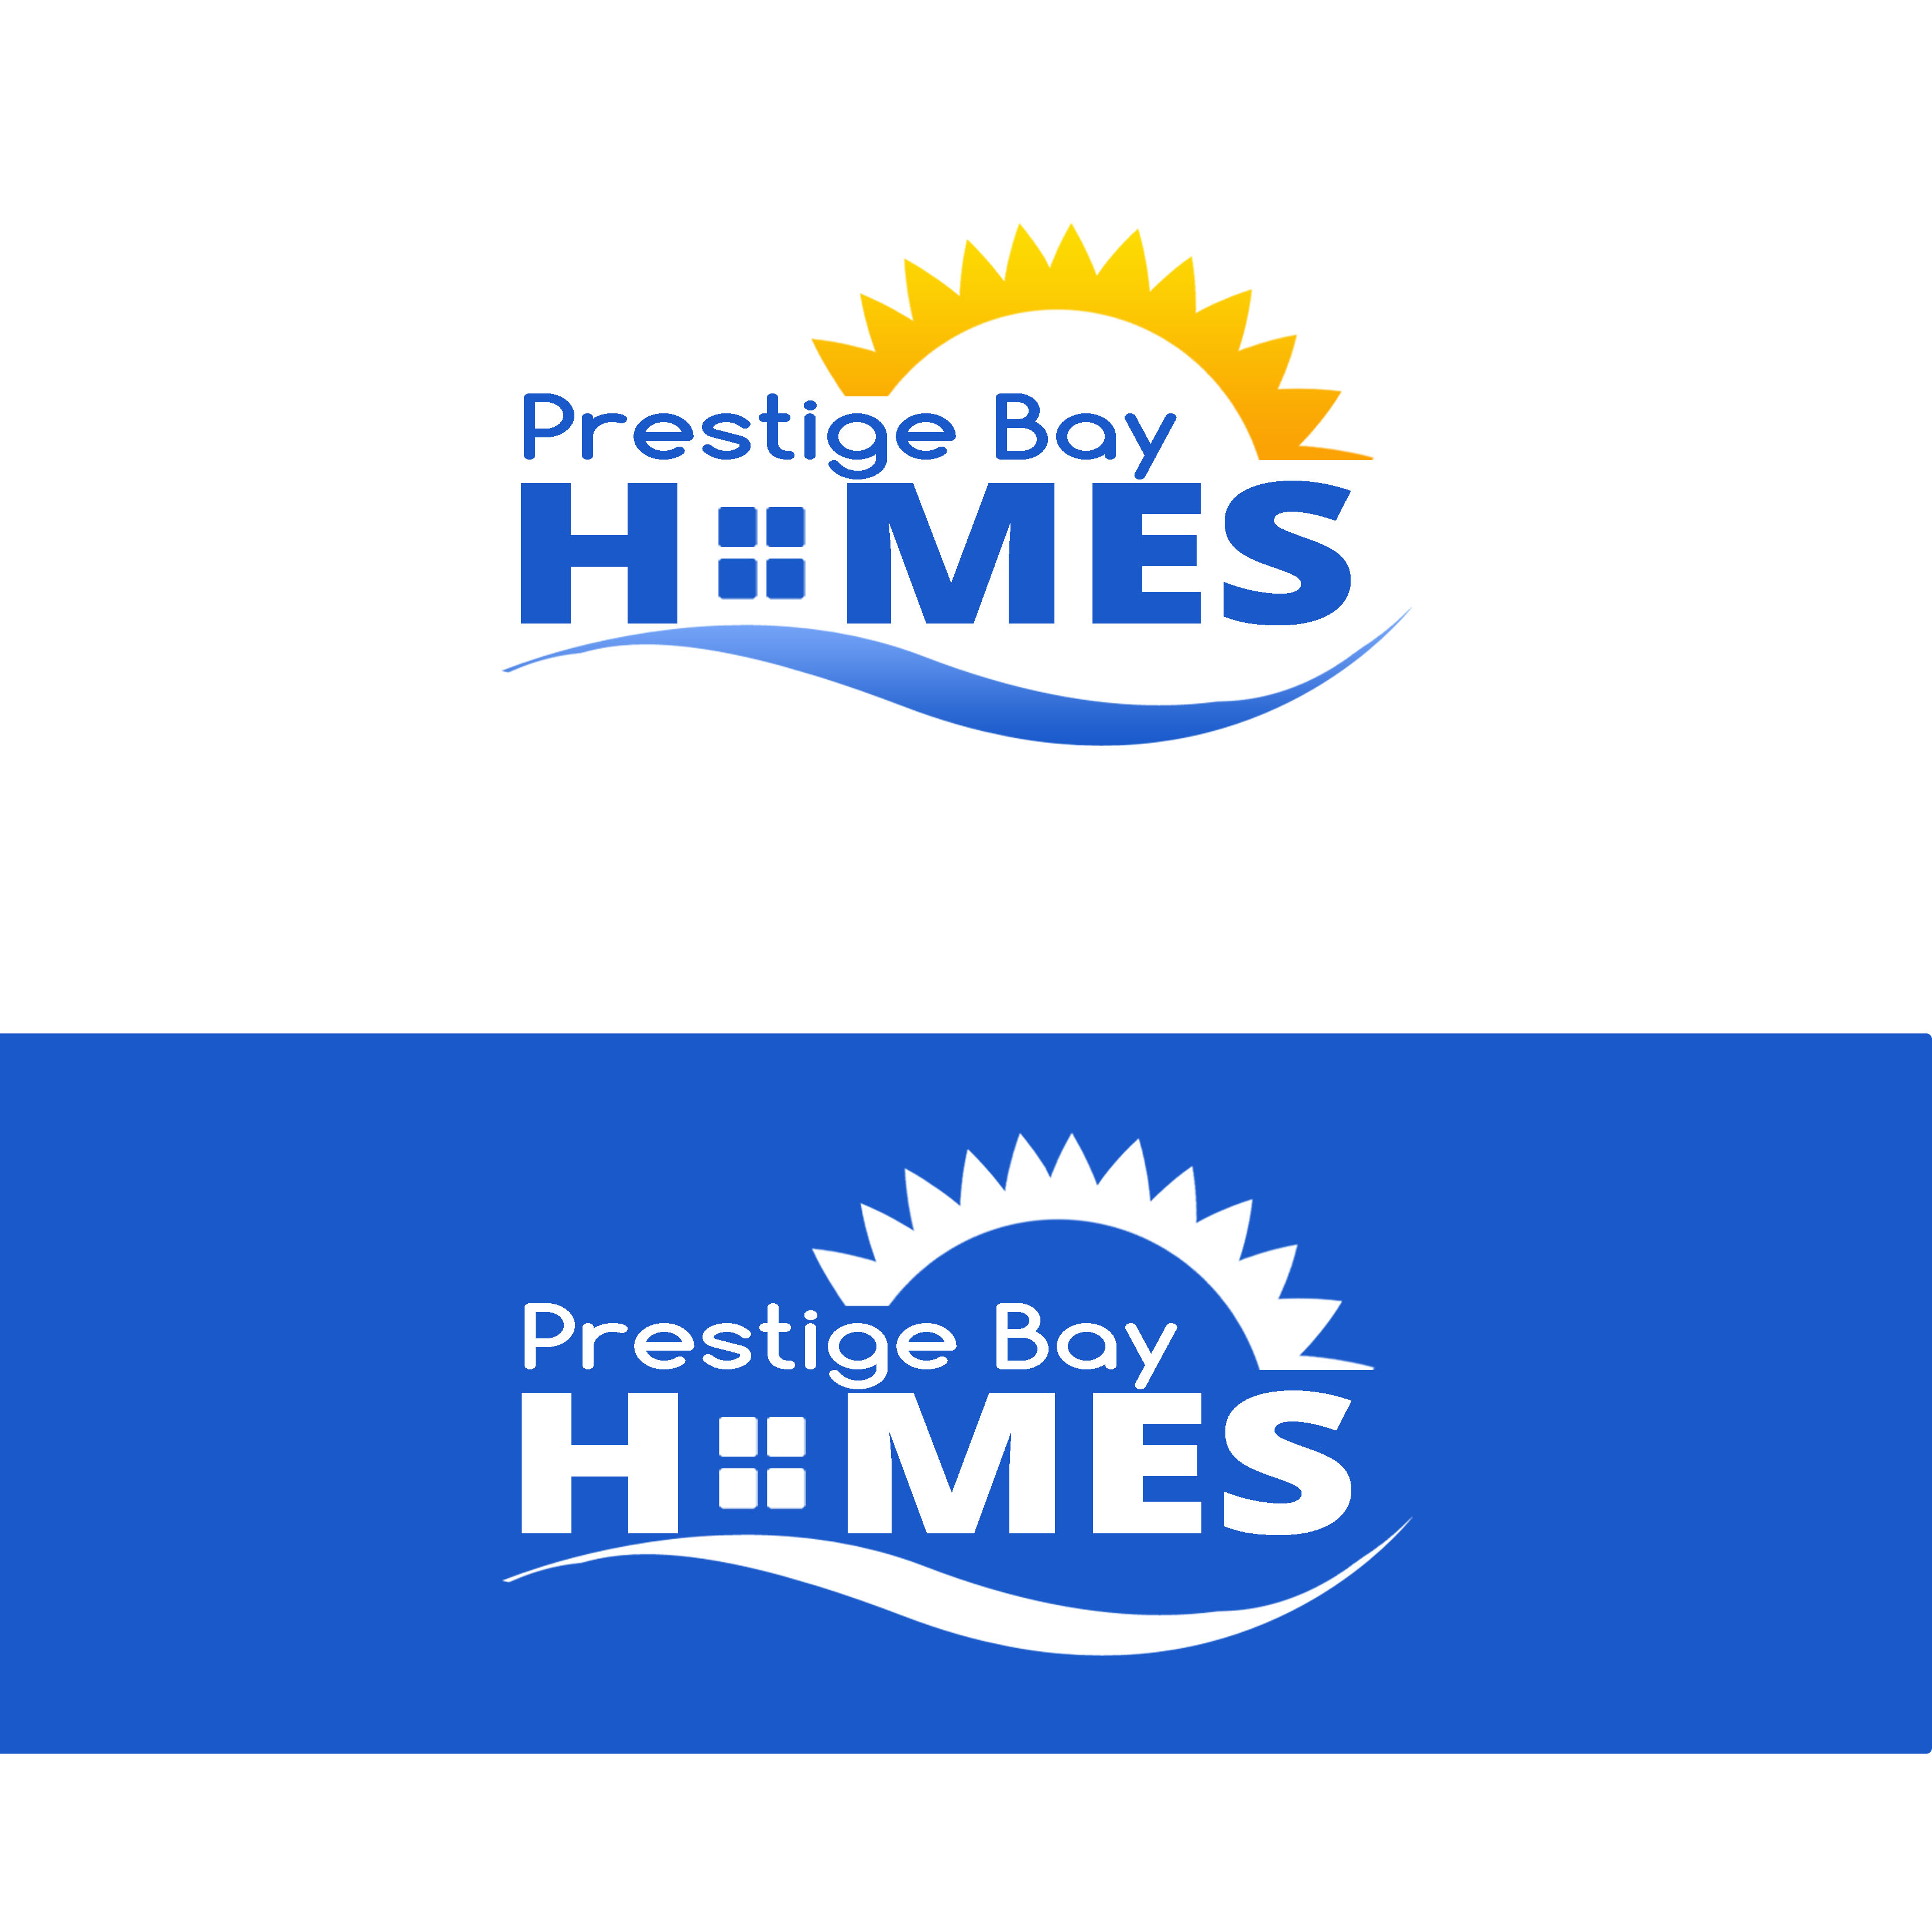 Logo Design by Allan Esclamado - Entry No. 46 in the Logo Design Contest Imaginative Logo Design for Prestige Bay Homes.